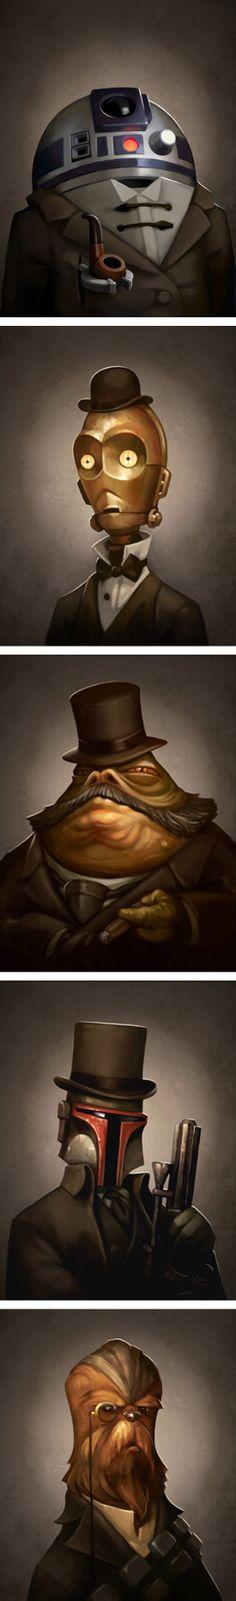 Victorian Star Wars Portraits by Greg Peltz